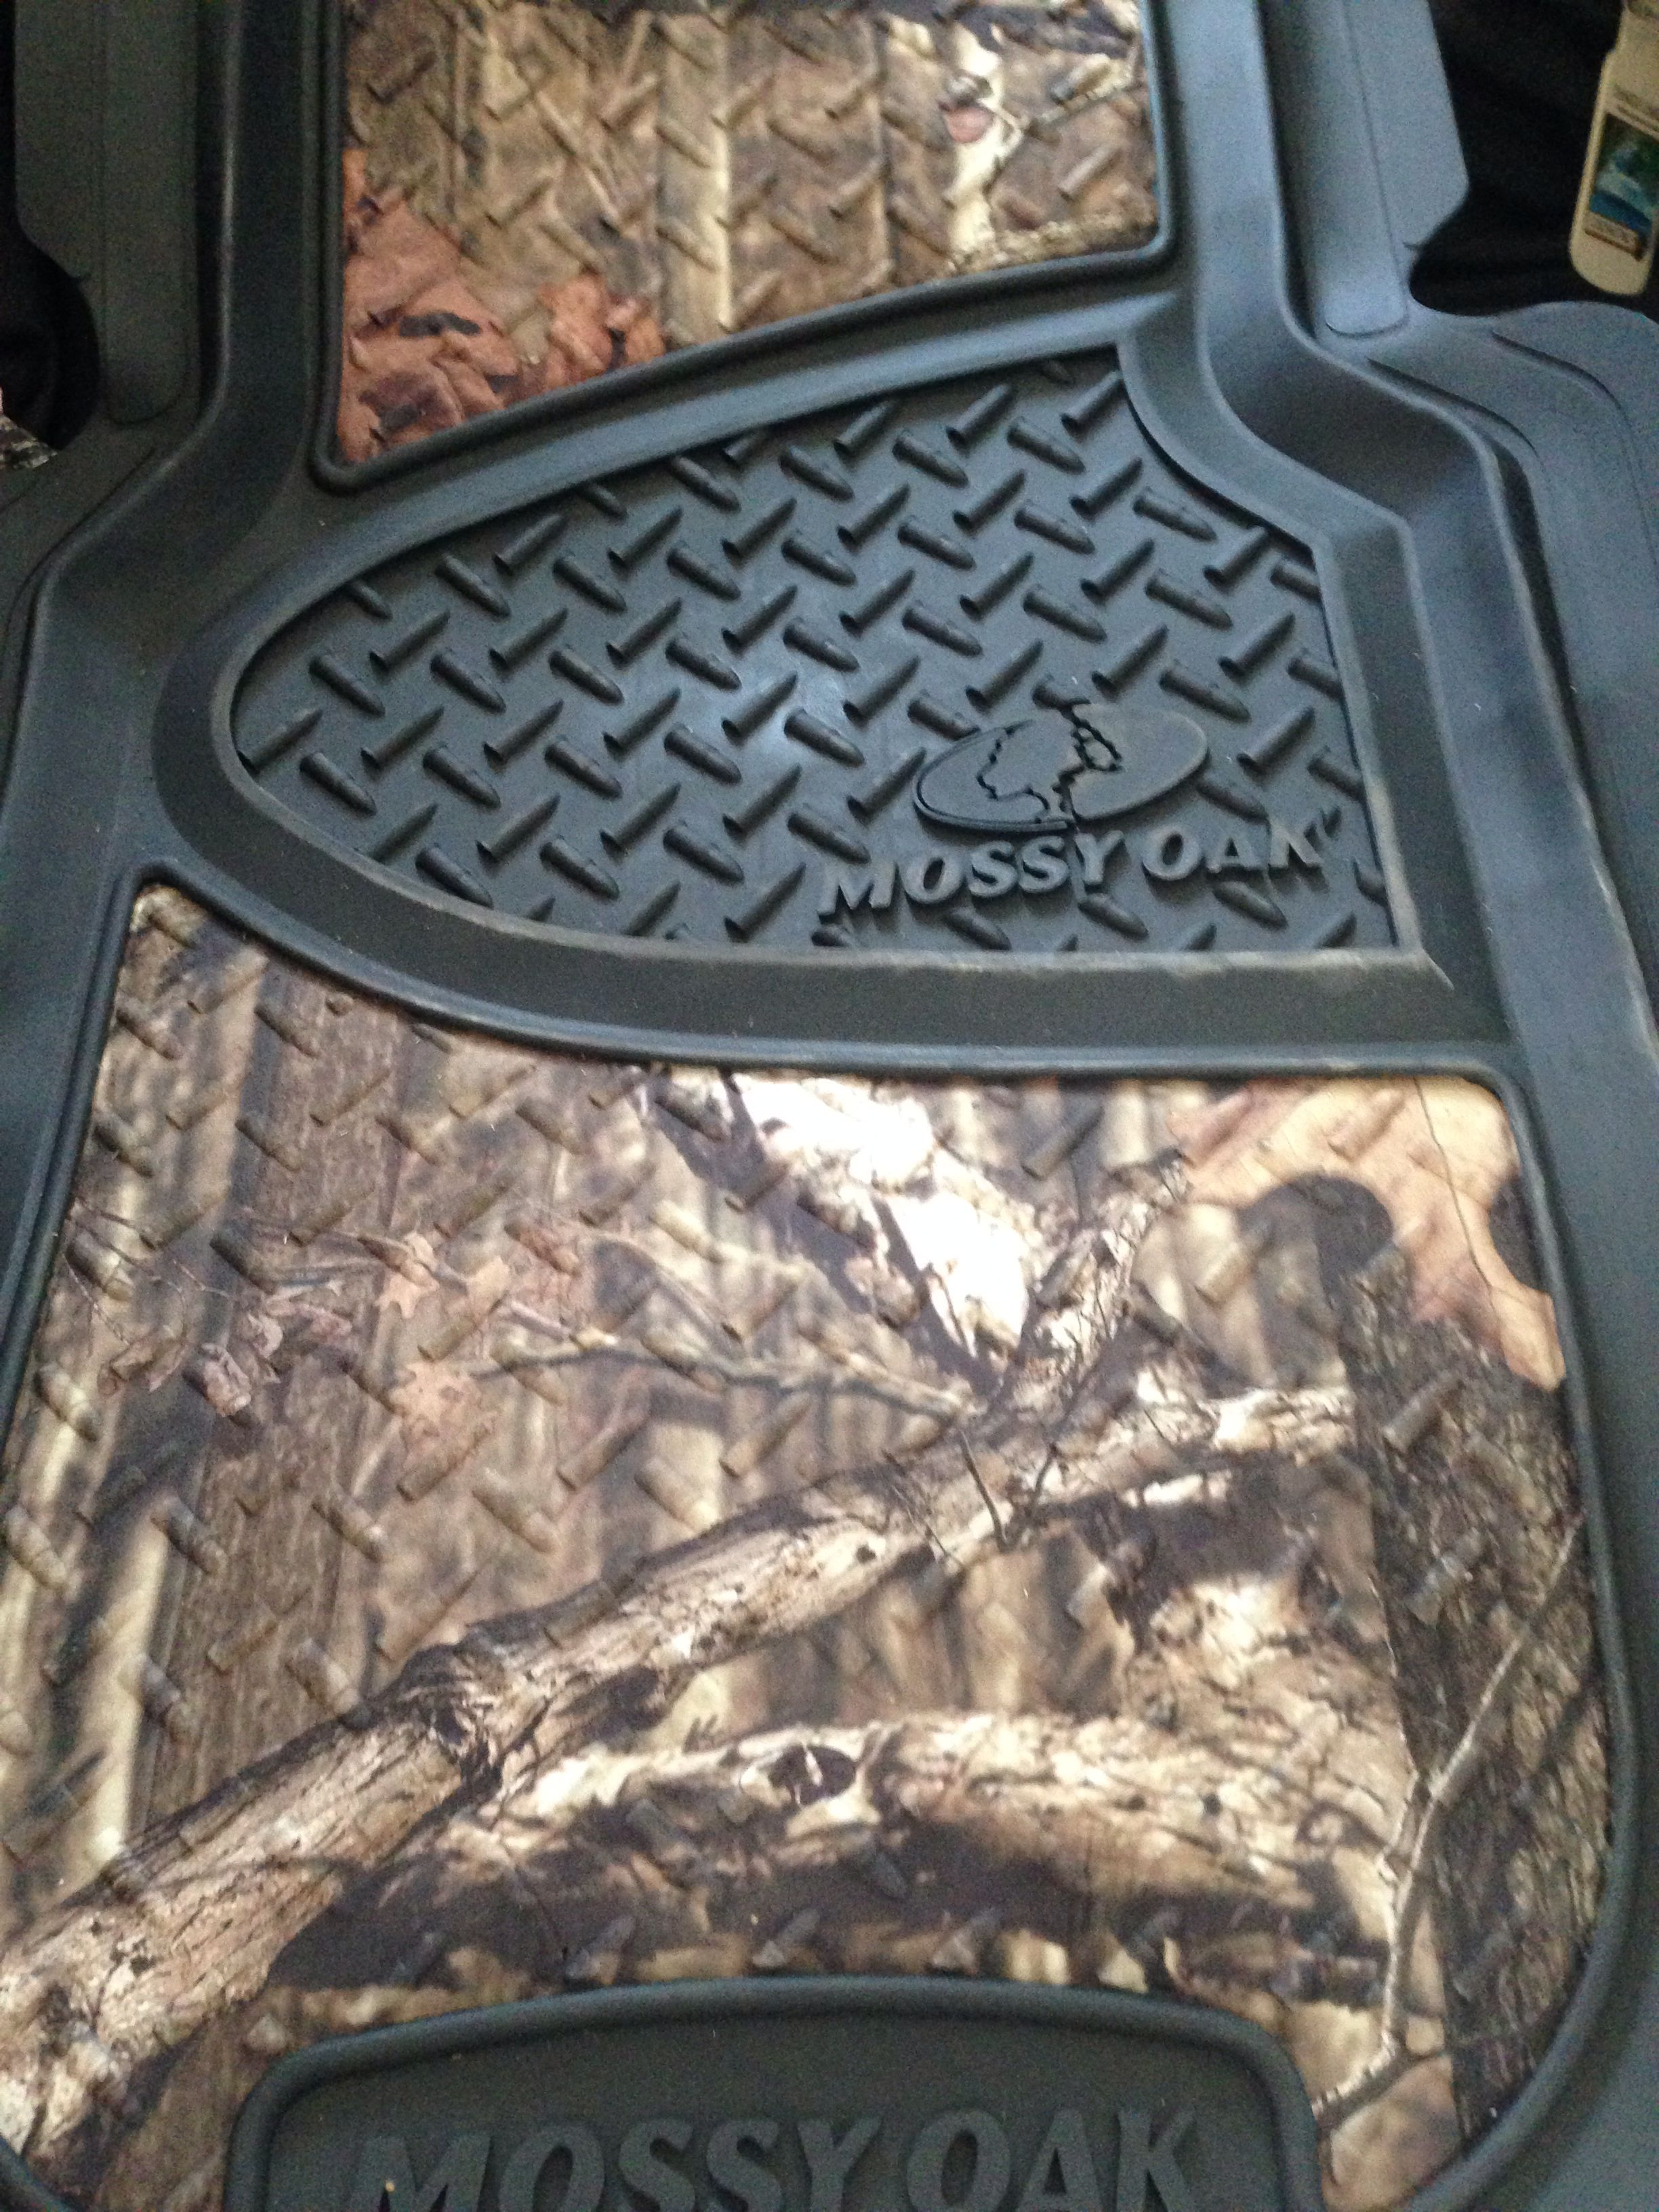 mats second raptor military marines grass shadow seat ford lloyd logo floors camo with floor